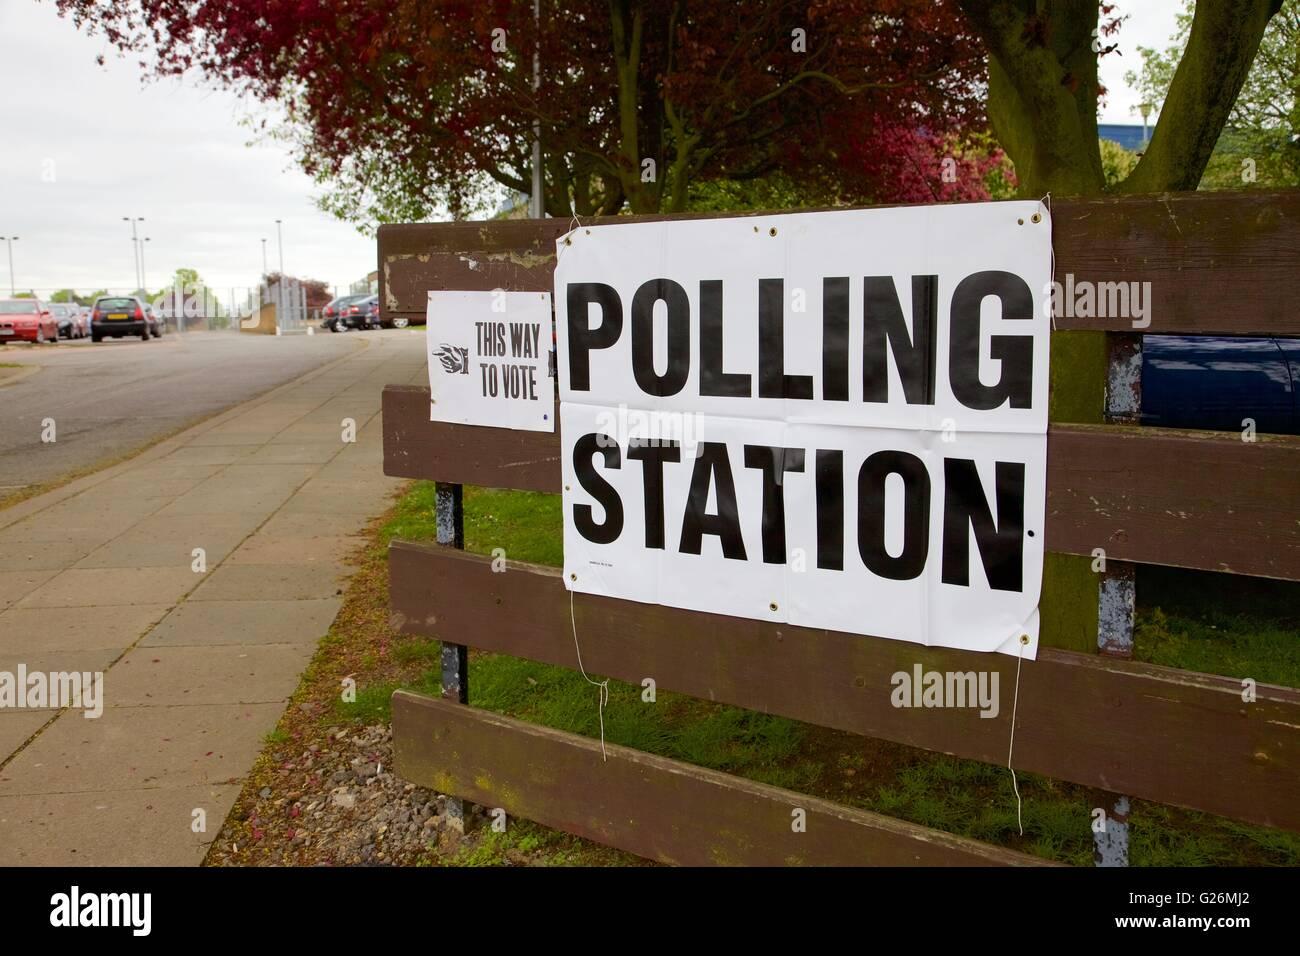 Polling station sign, England - Stock Image